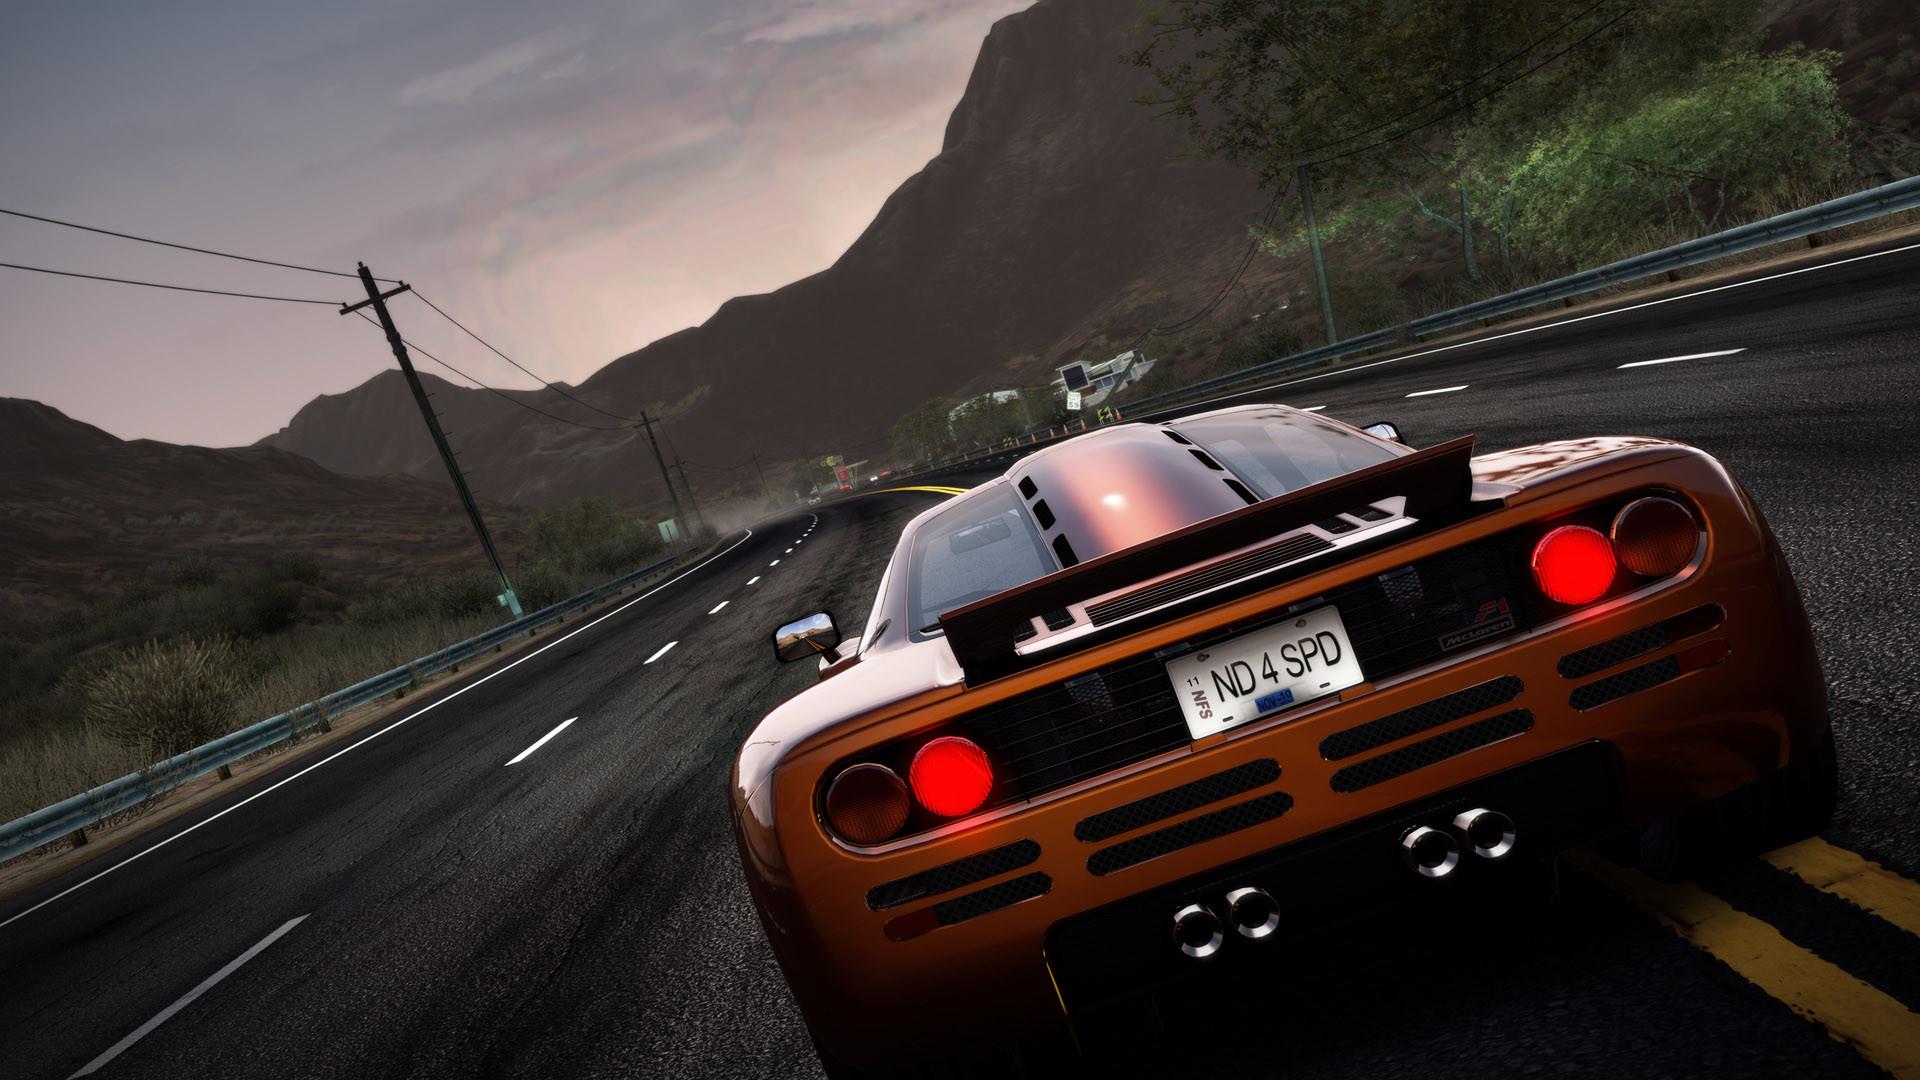 tremendous-car-hd-wallpapers-new-cool-desktop-backgrounds-